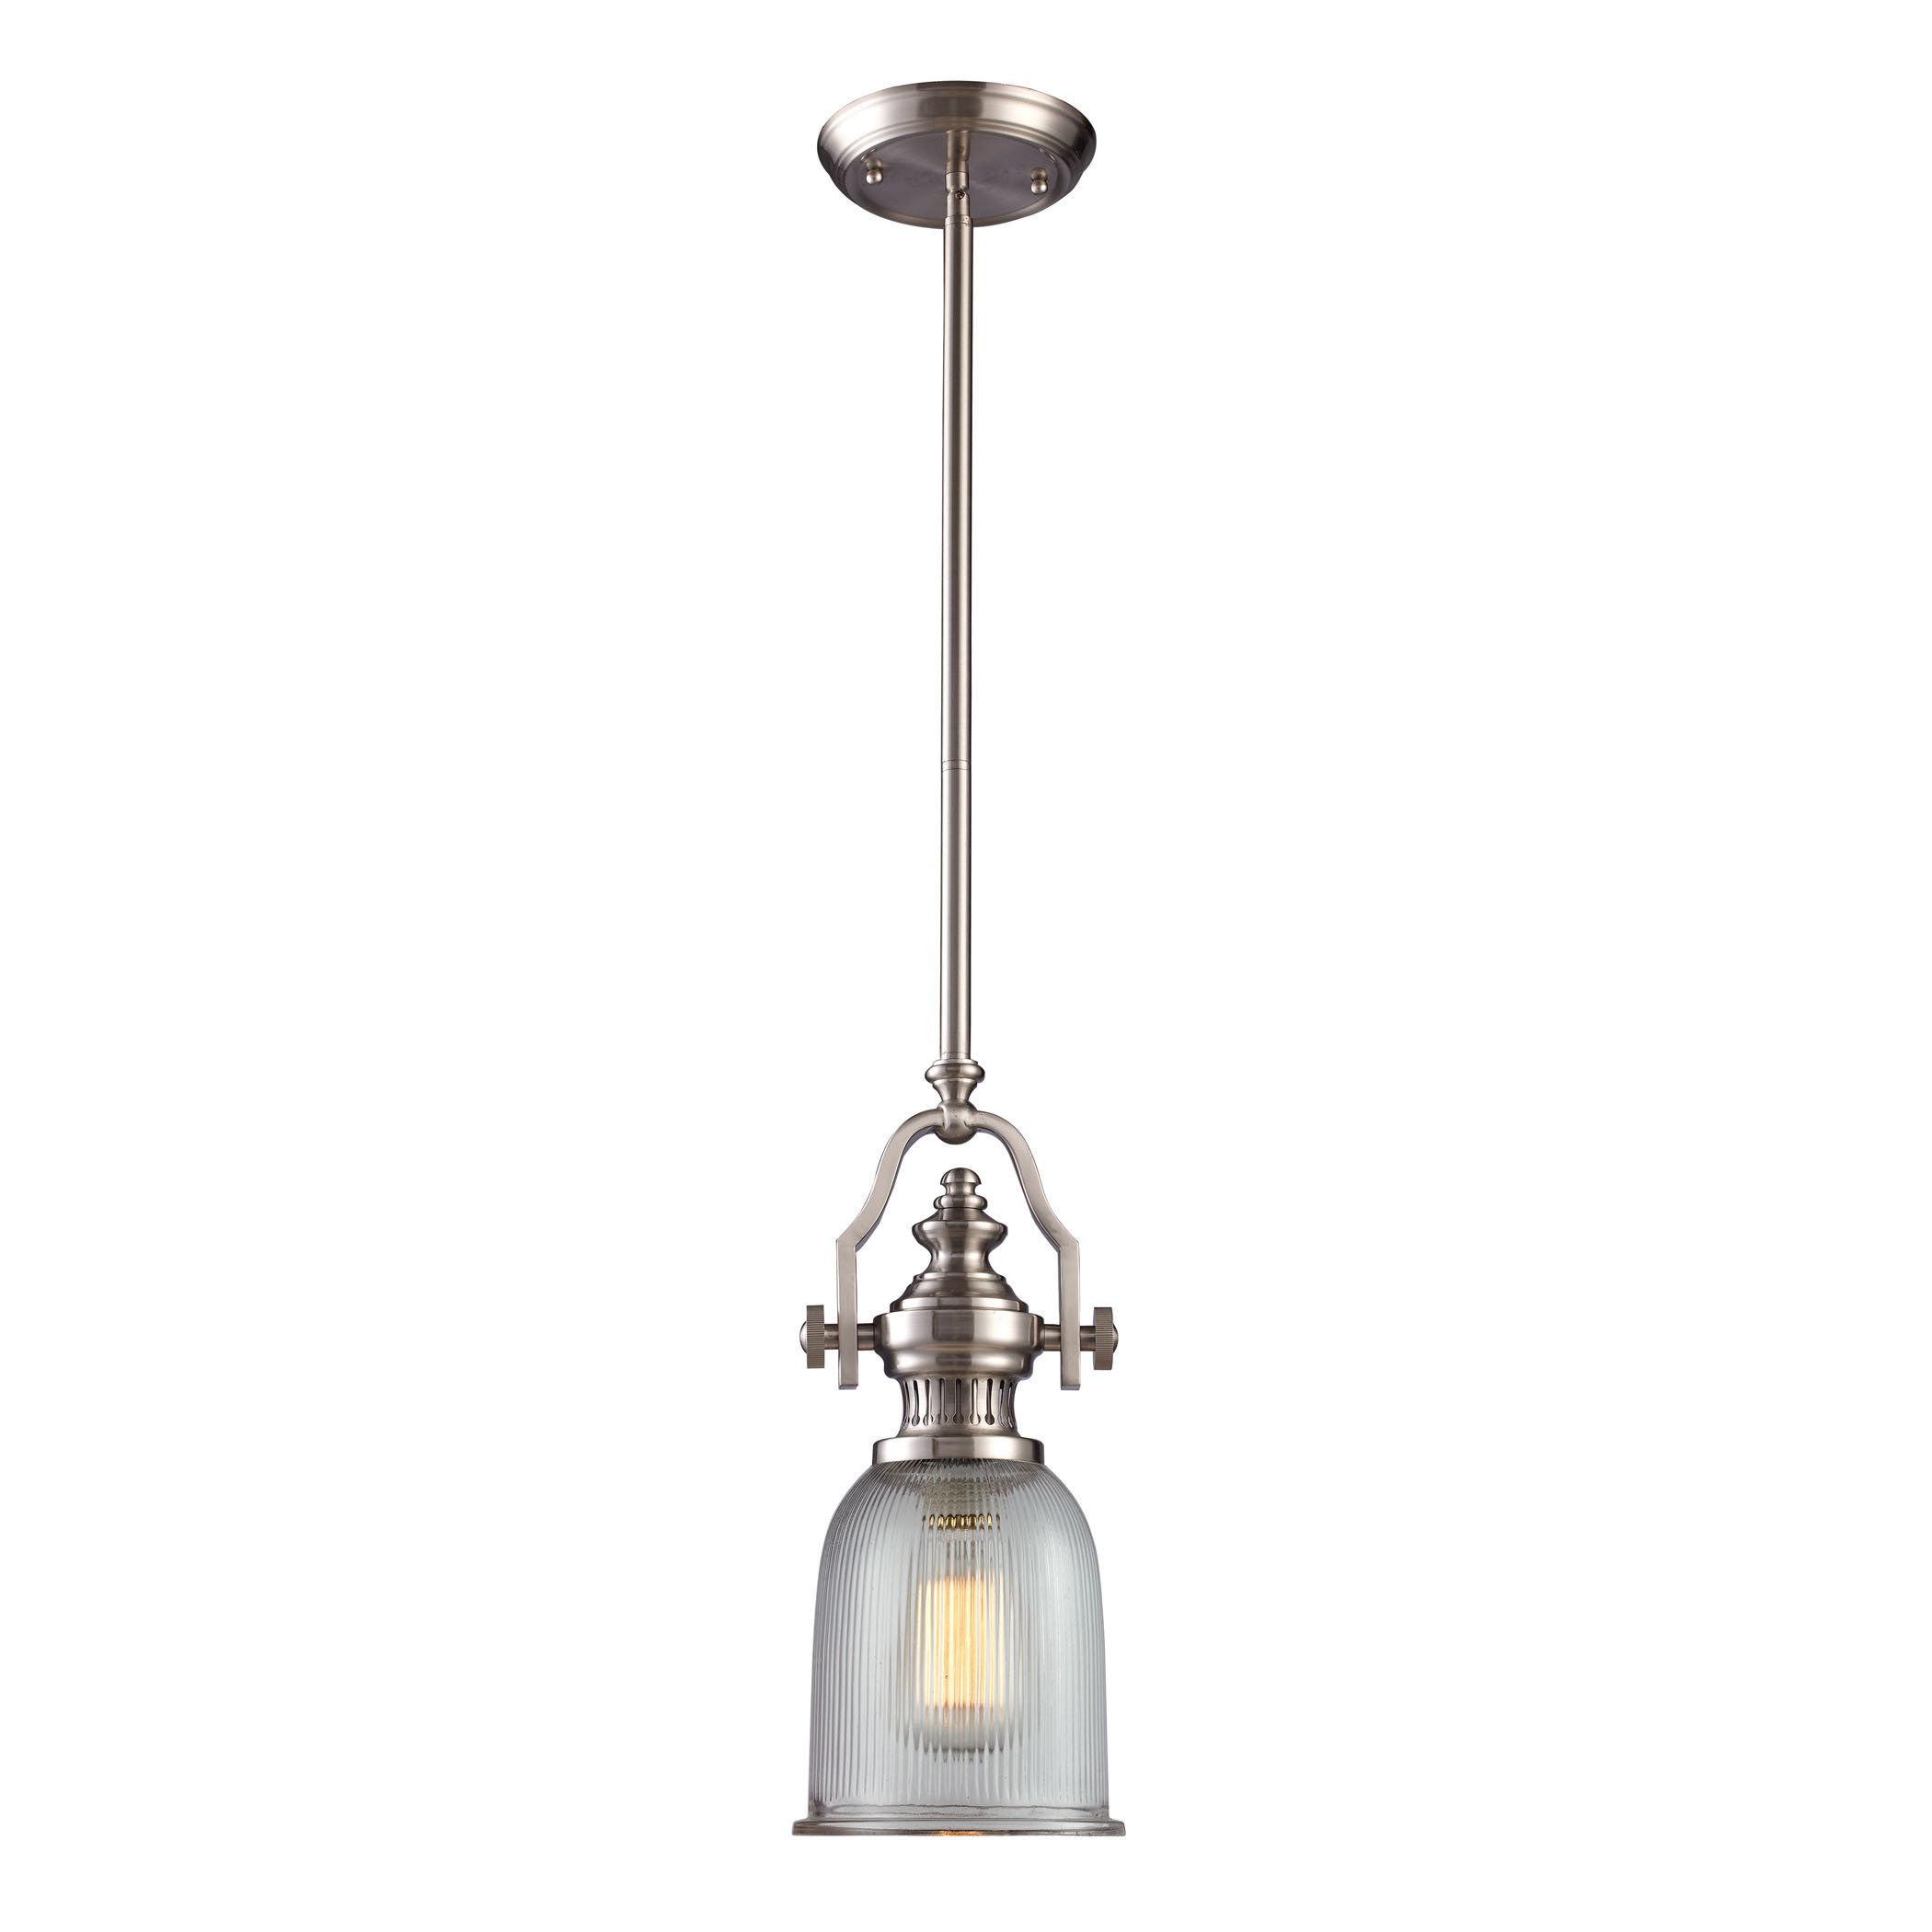 Erico 1 Light Single Bell Pendant Regarding Erico 1 Light Single Bell Pendants (View 3 of 30)